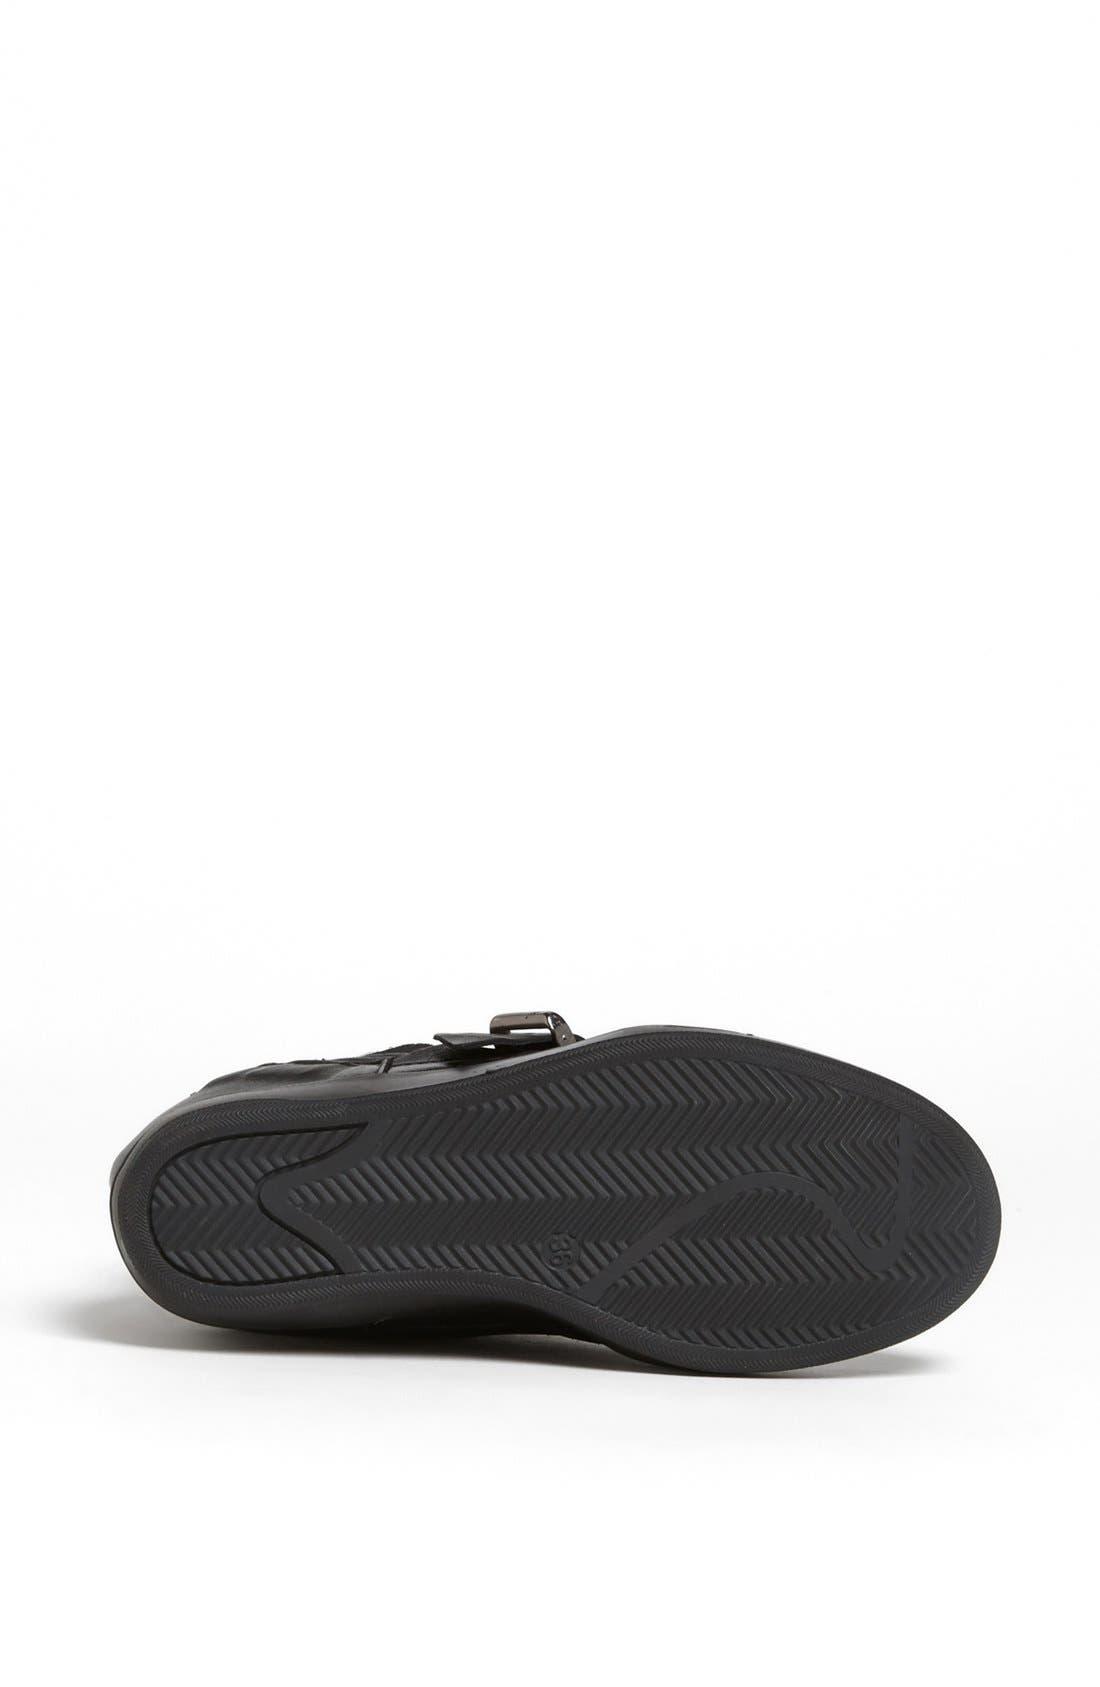 'Lucas' Wedge Sneaker,                             Alternate thumbnail 4, color,                             001